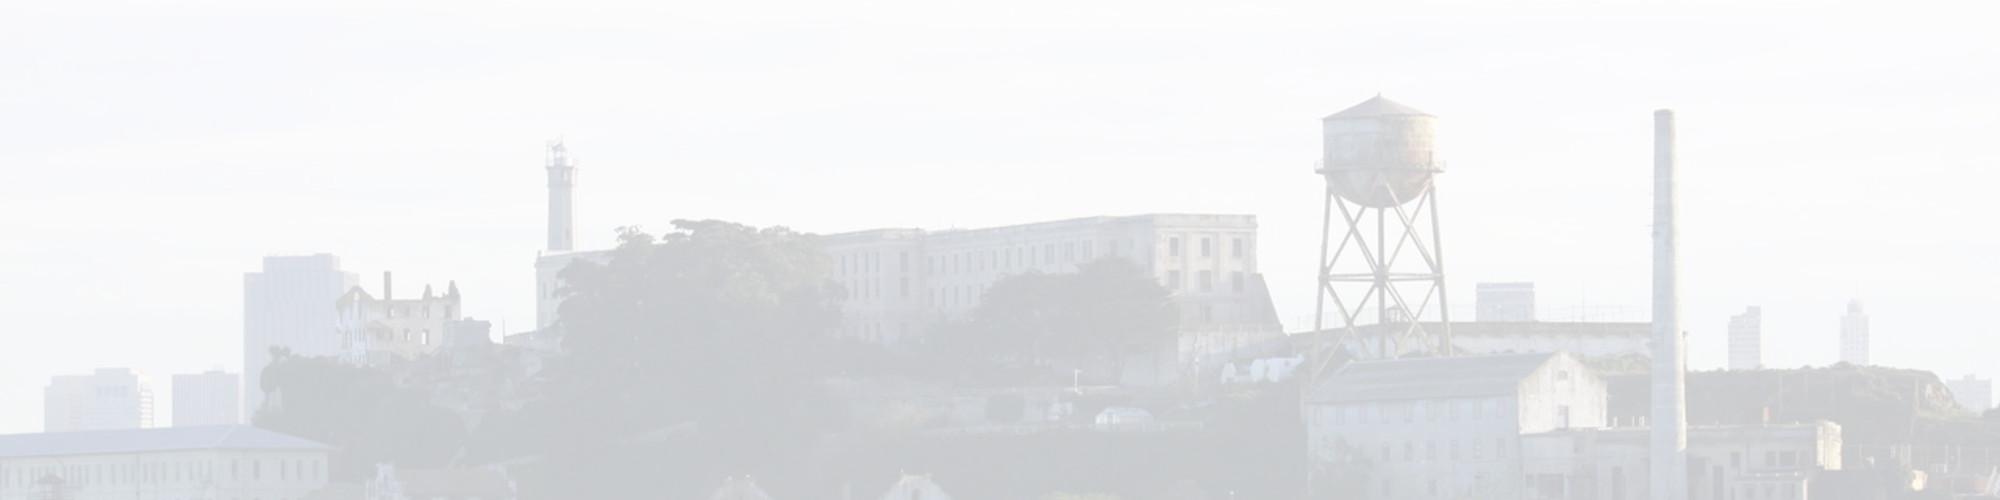 Alcatraz banner